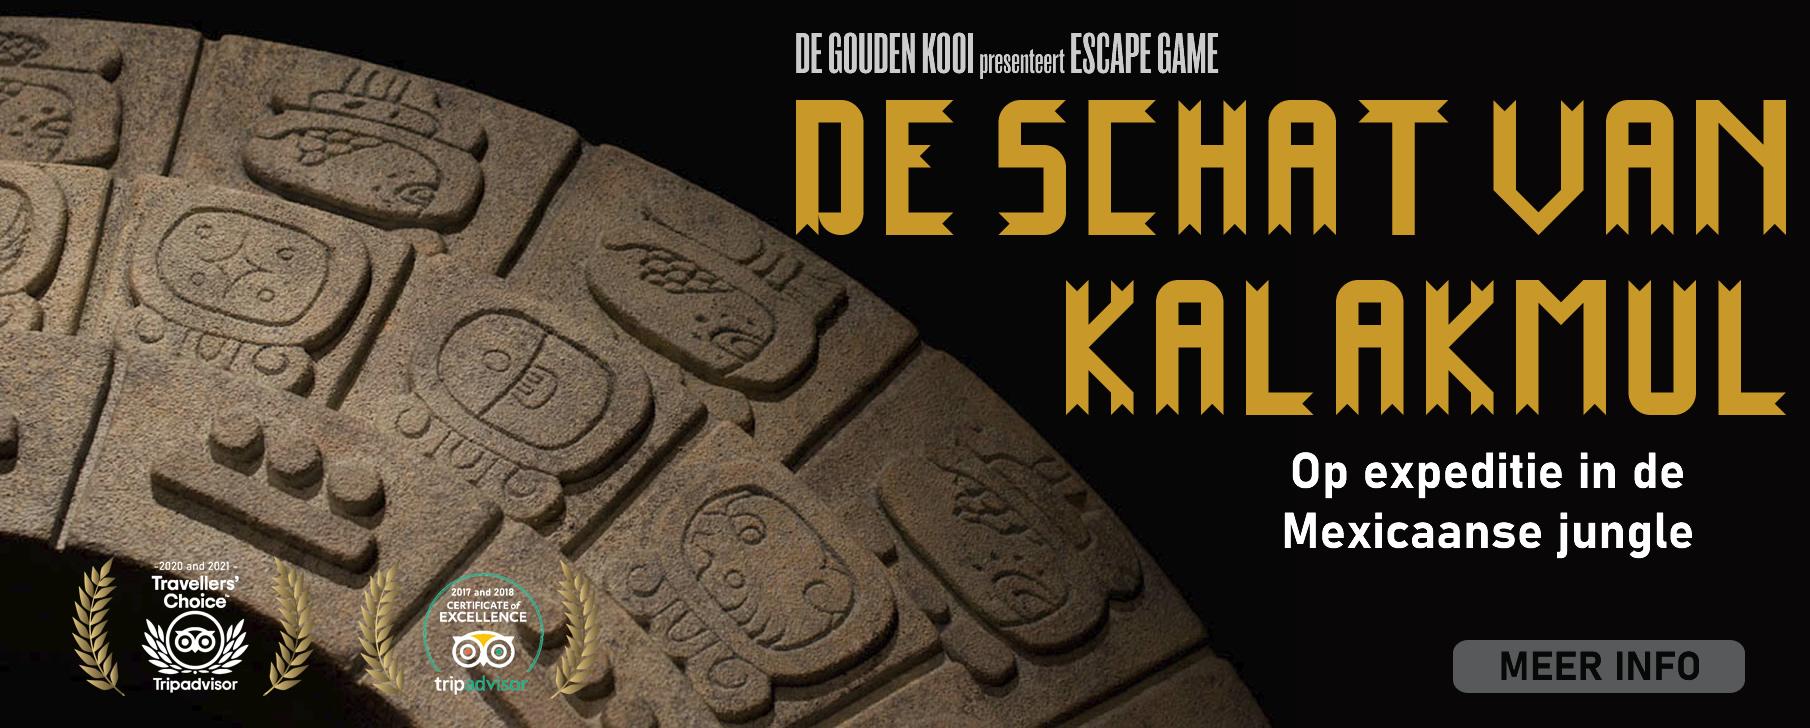 Escape game De Gouden Kooi - De schat van Kalakmul